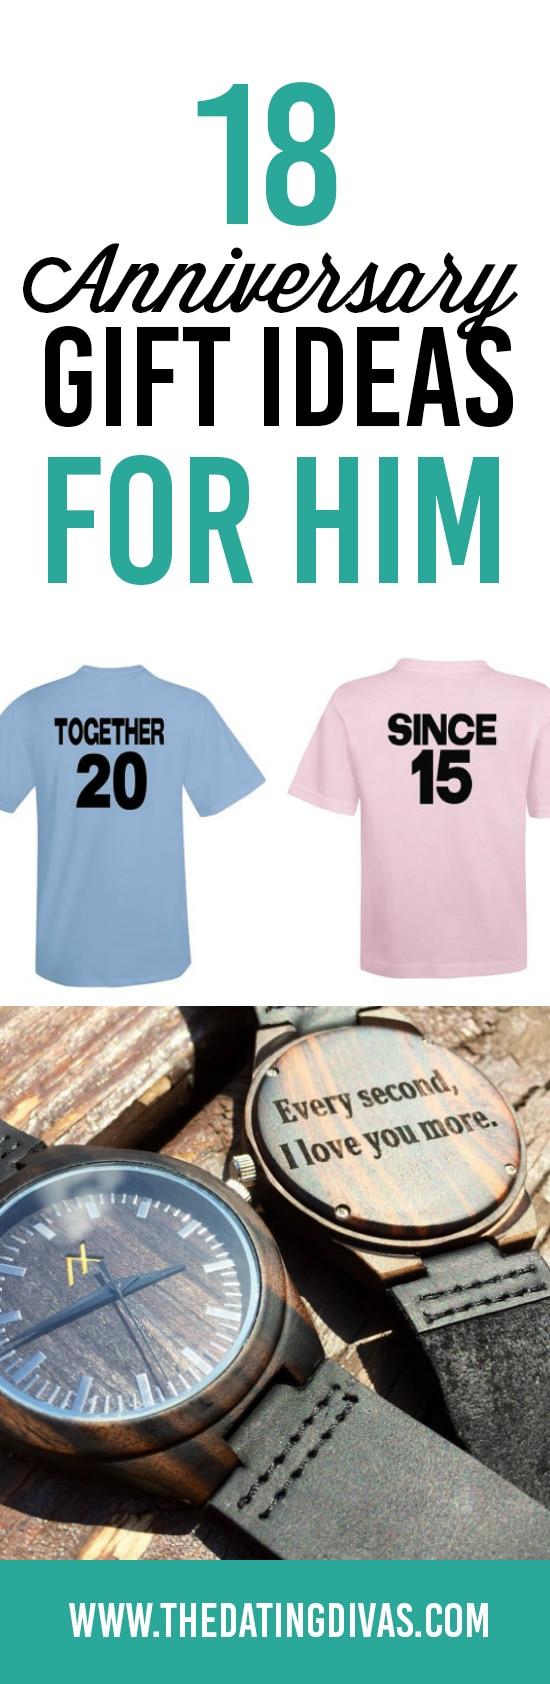 3rd anniversary gift ideas